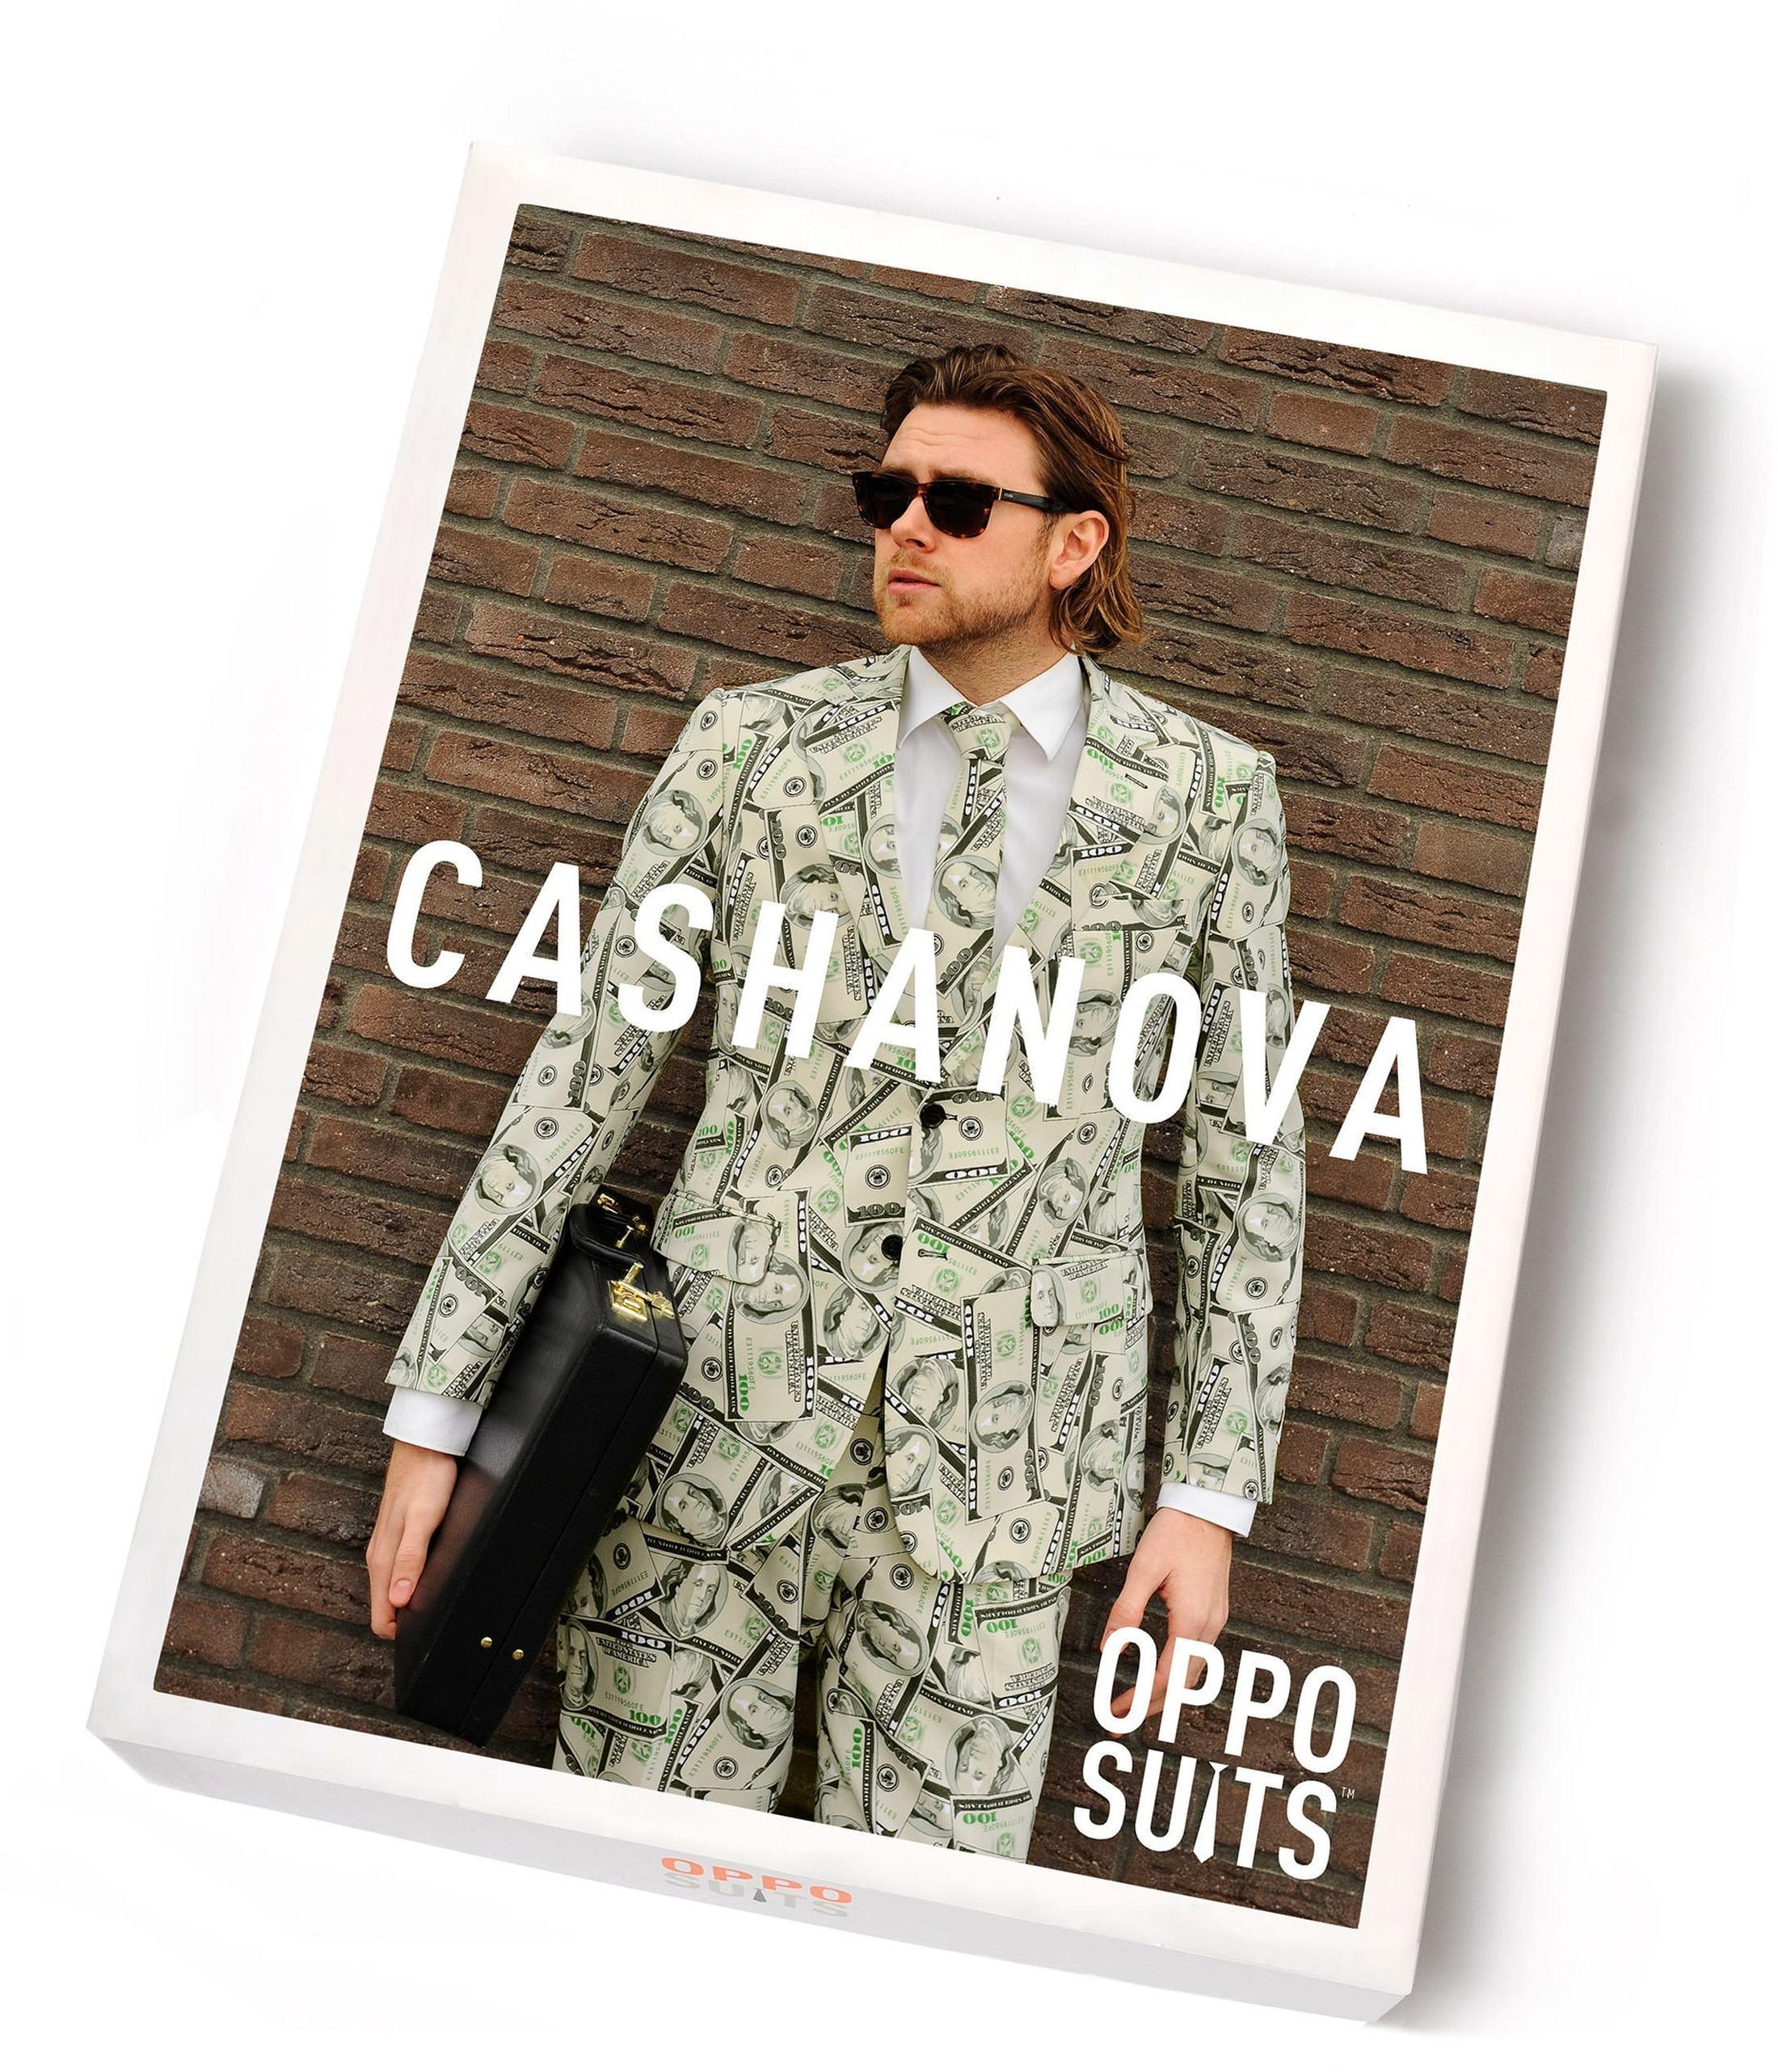 OppoSuits Cashanova Kostüm foto 5